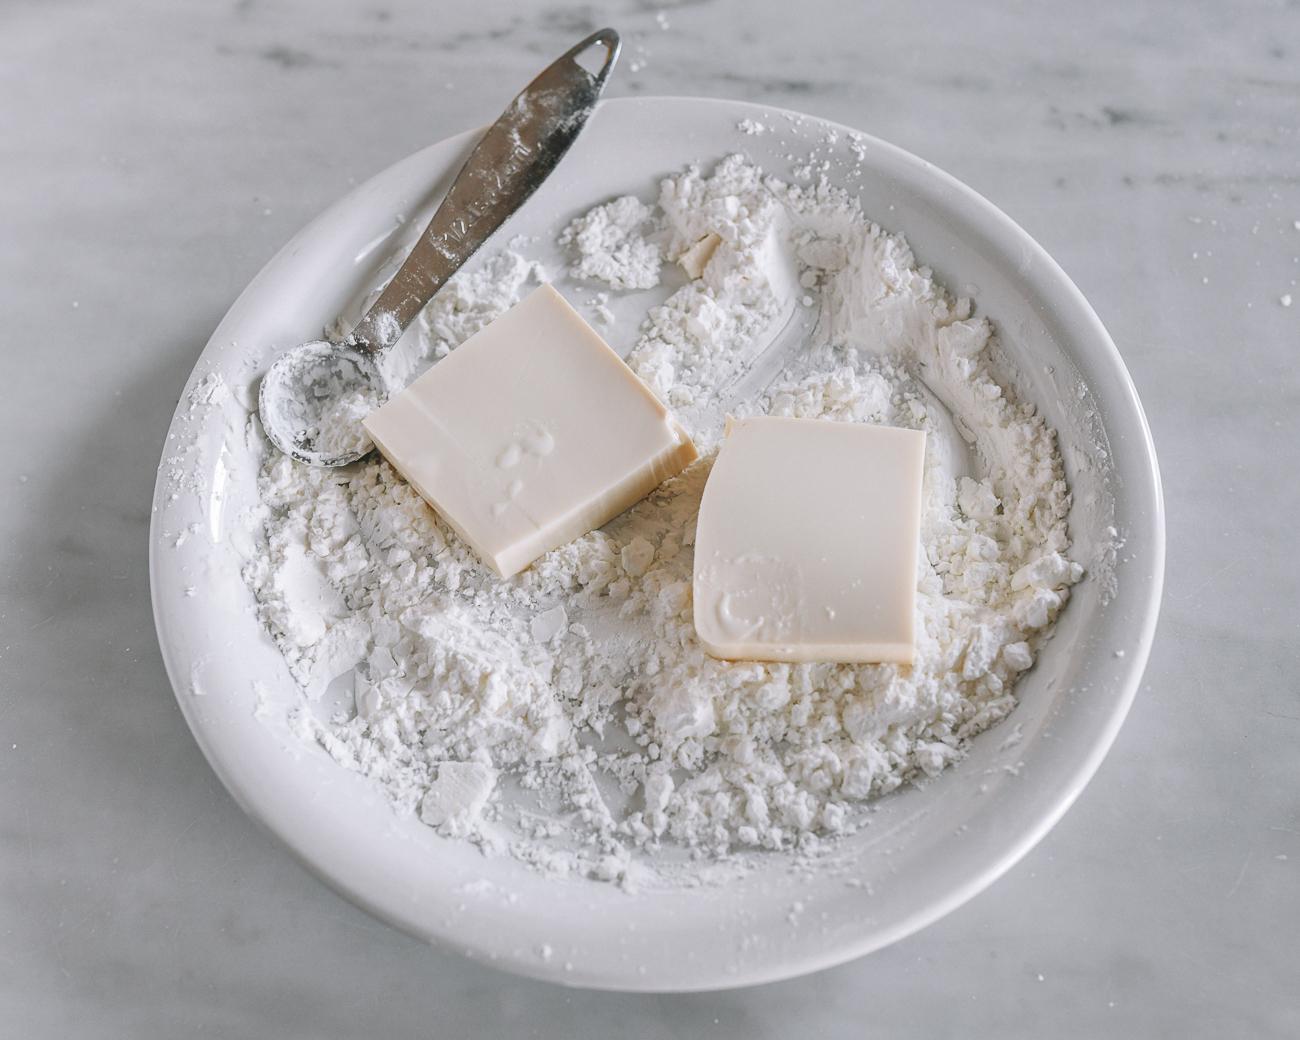 Dredging tofu in cornstarch